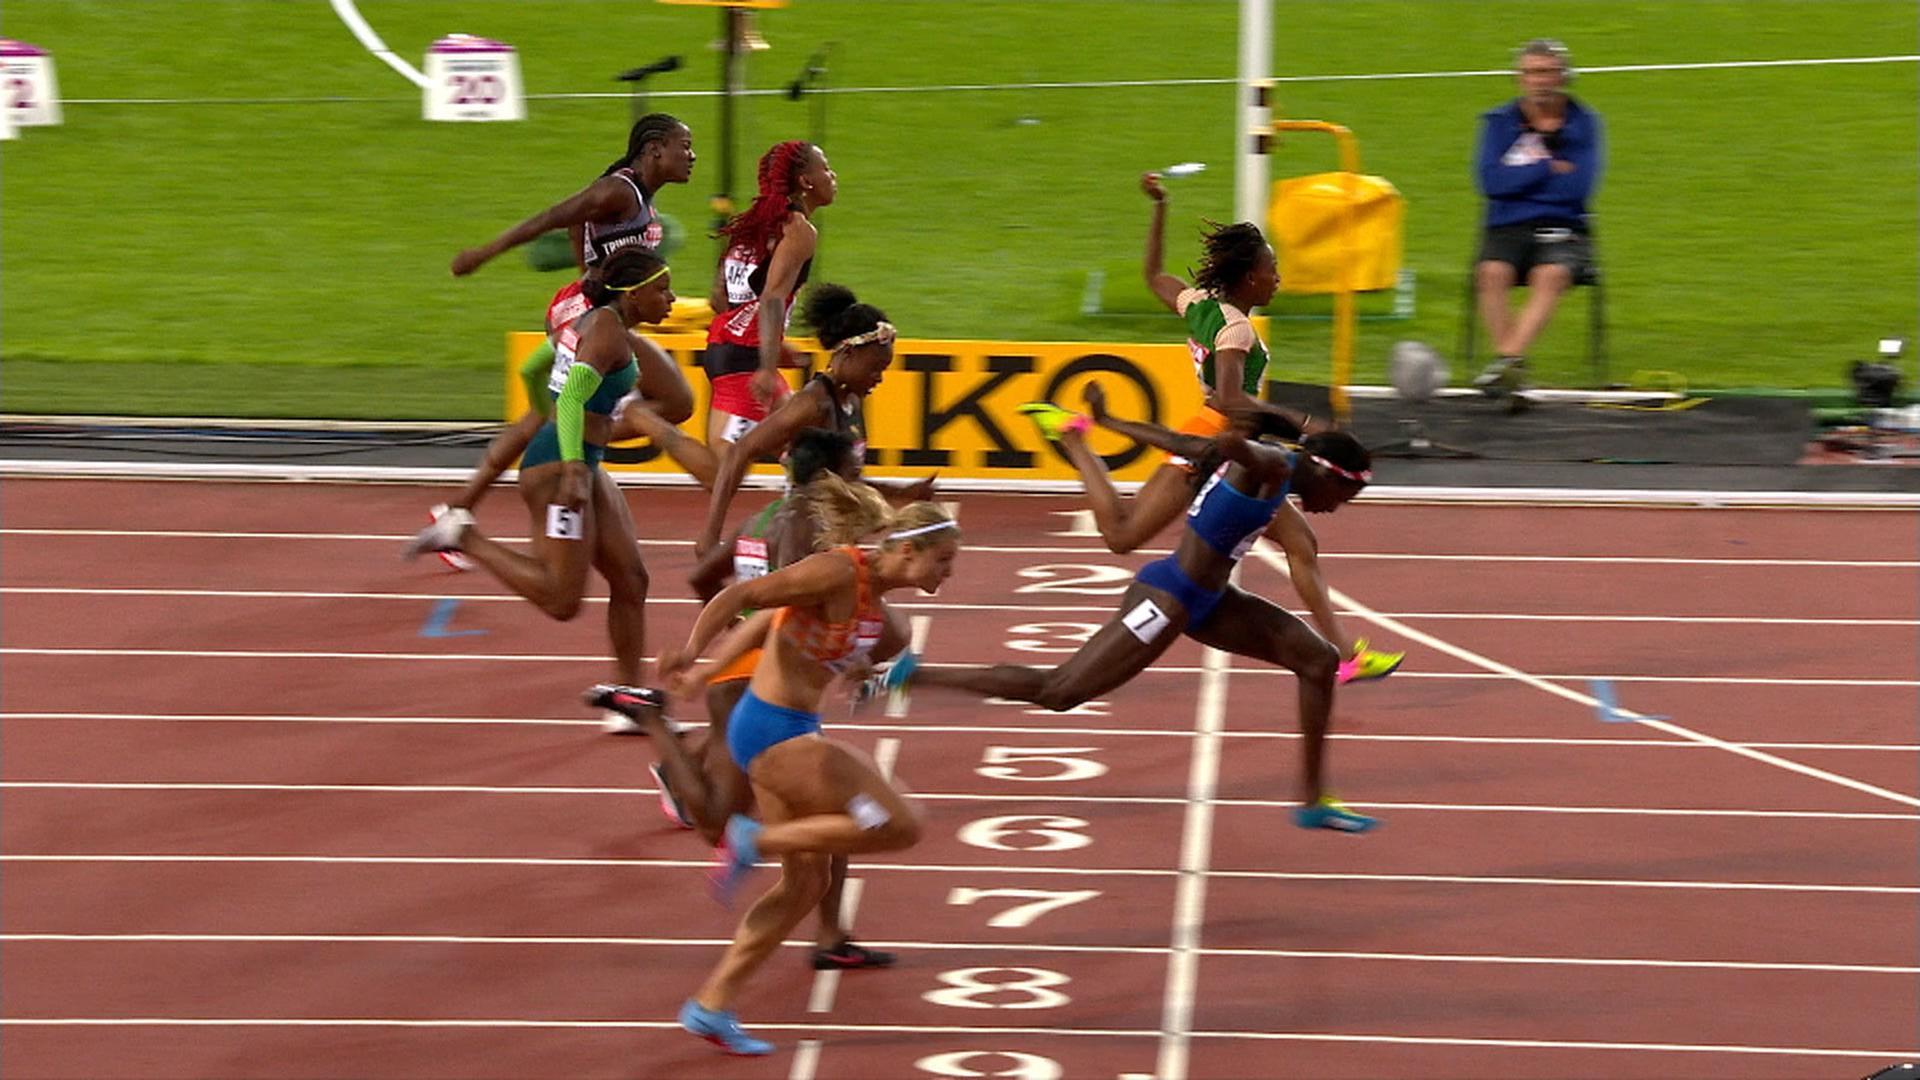 Die 100 Meter Der Frauen Zdfmediathek